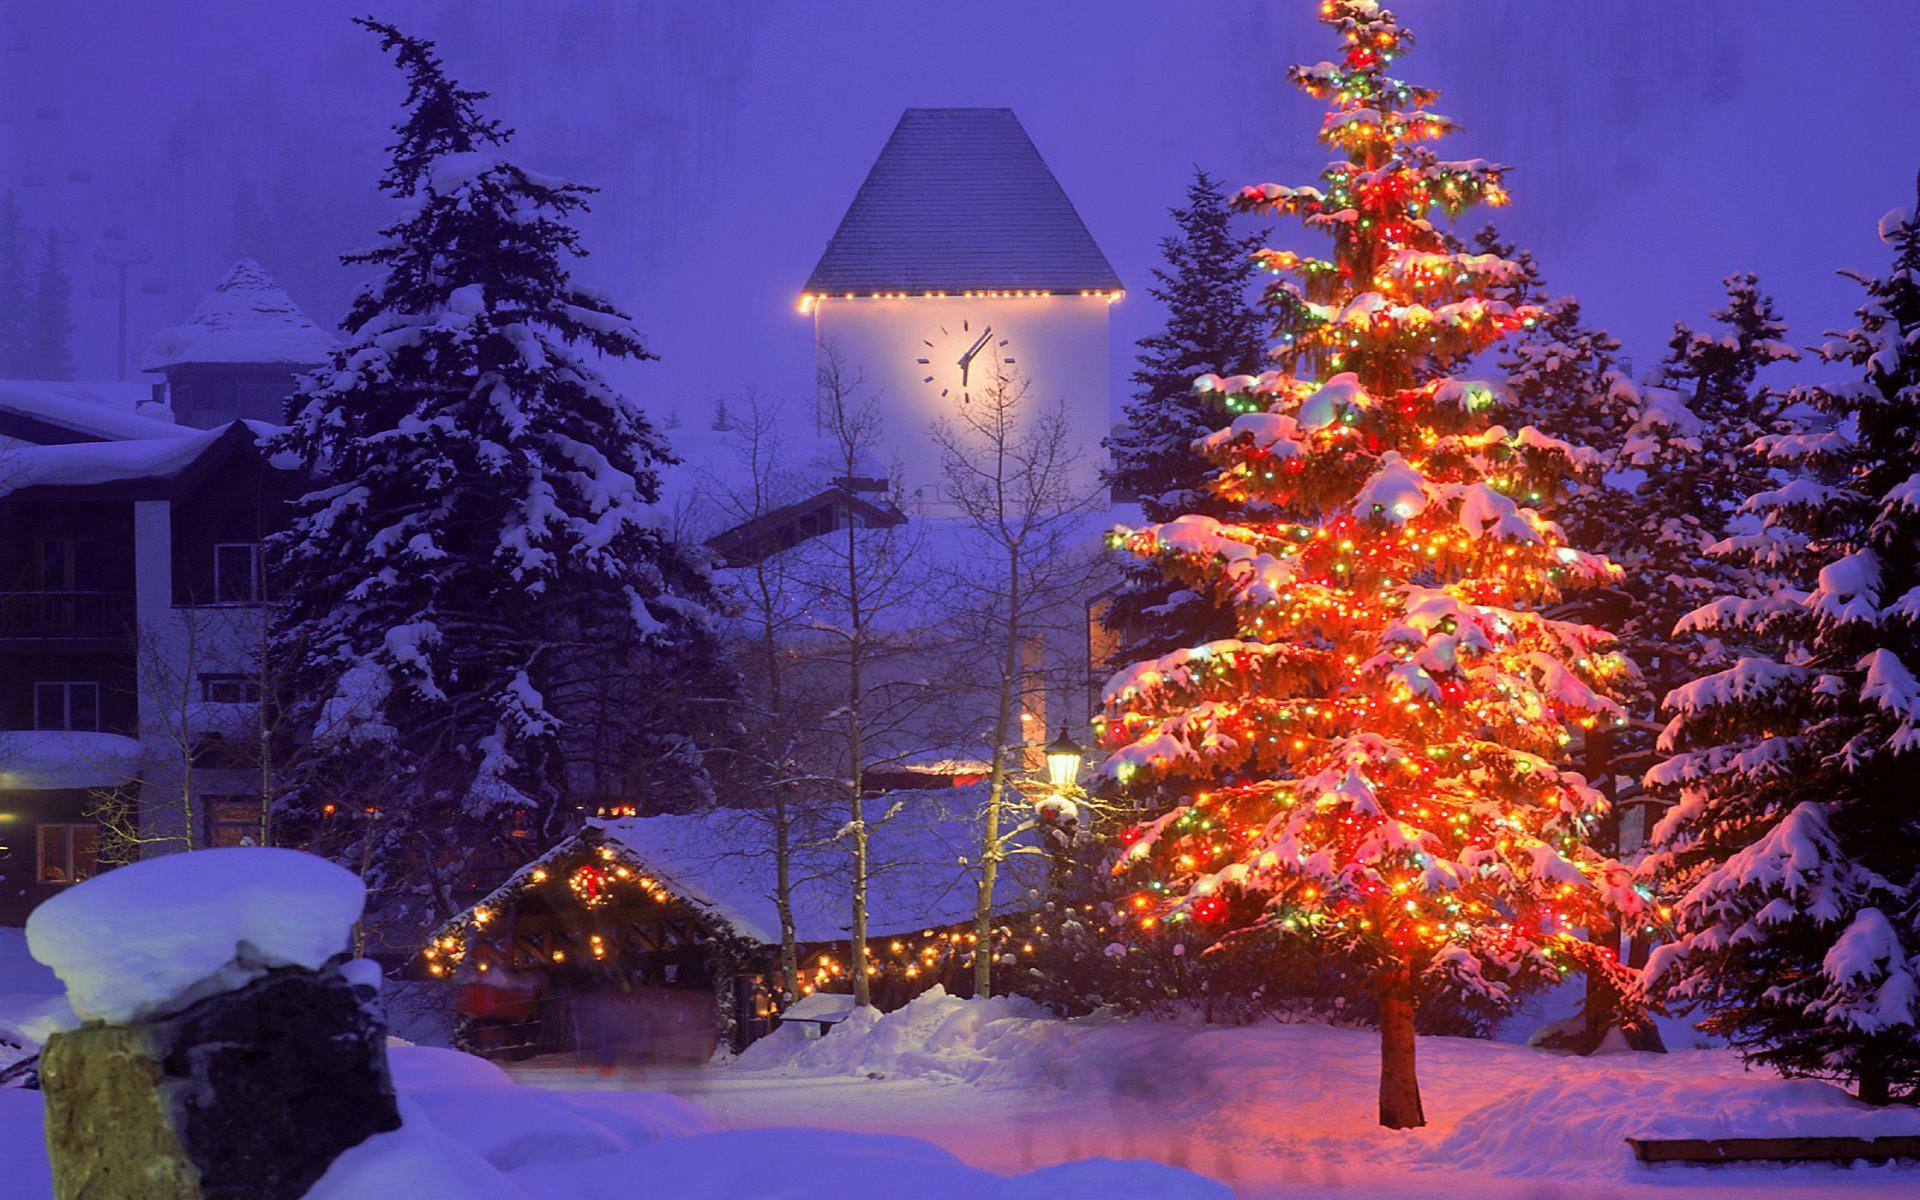 christmas lights desktop wallpaper 58 images